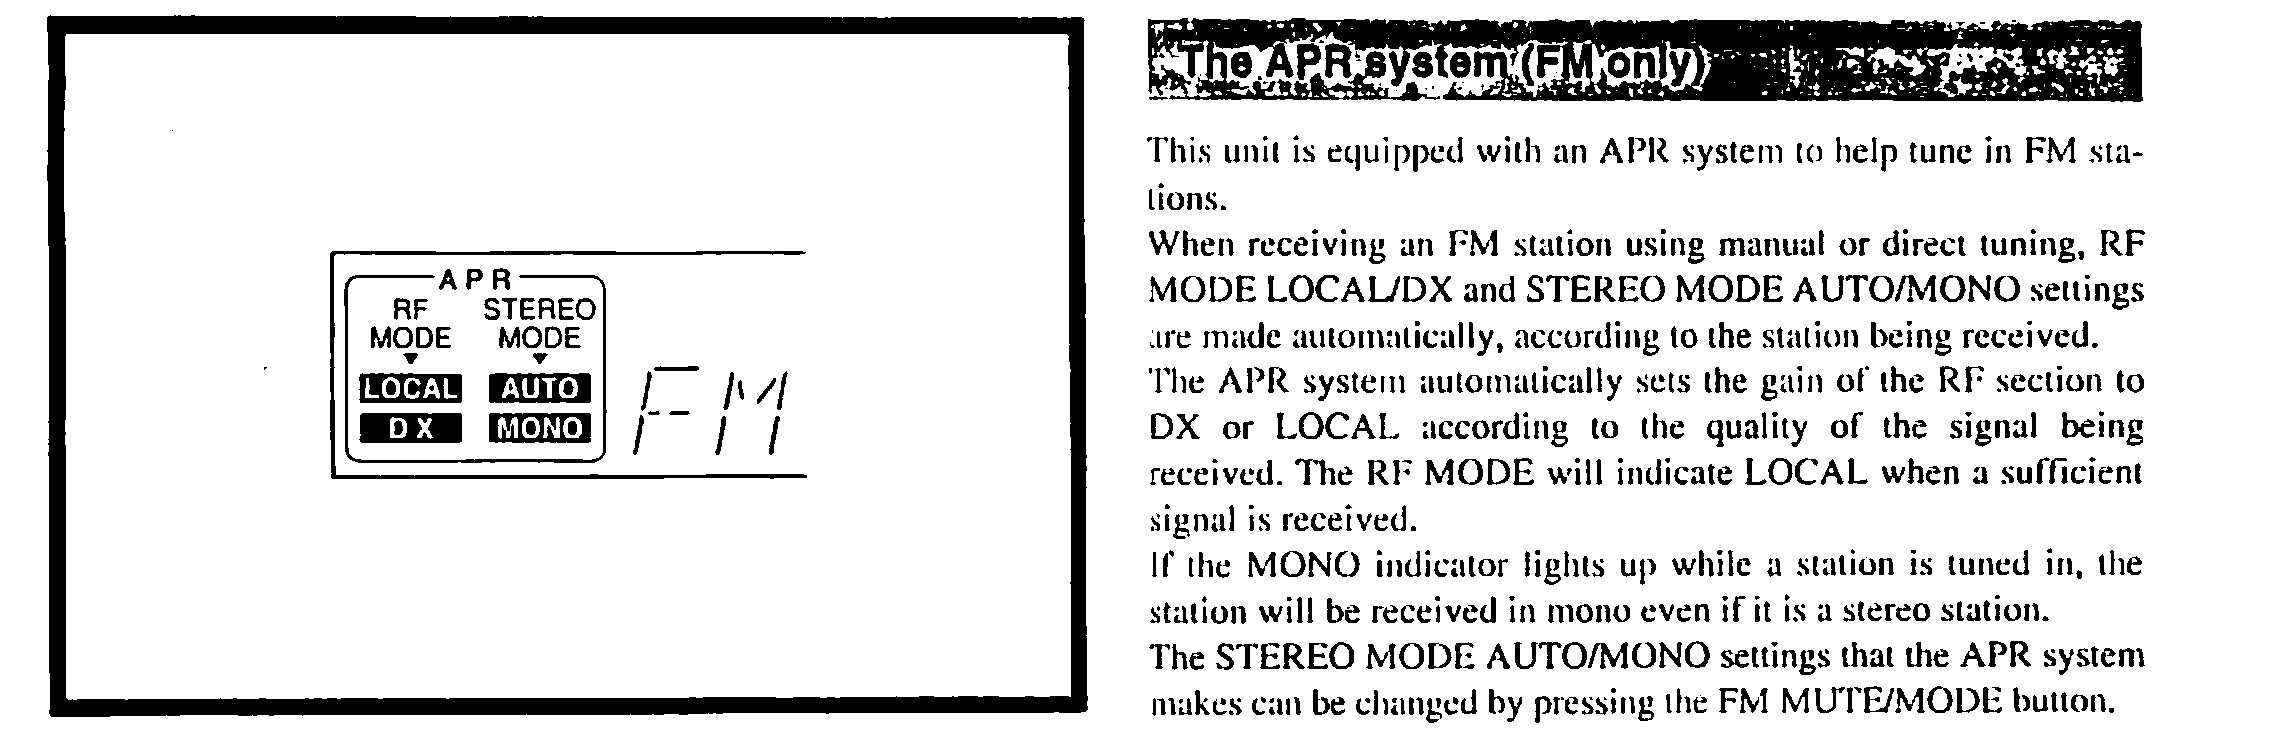 ONKYO TX-8211 - Ma�e problemy z obs�ug� amplitunera: RF MODE i przycisk GROUP.